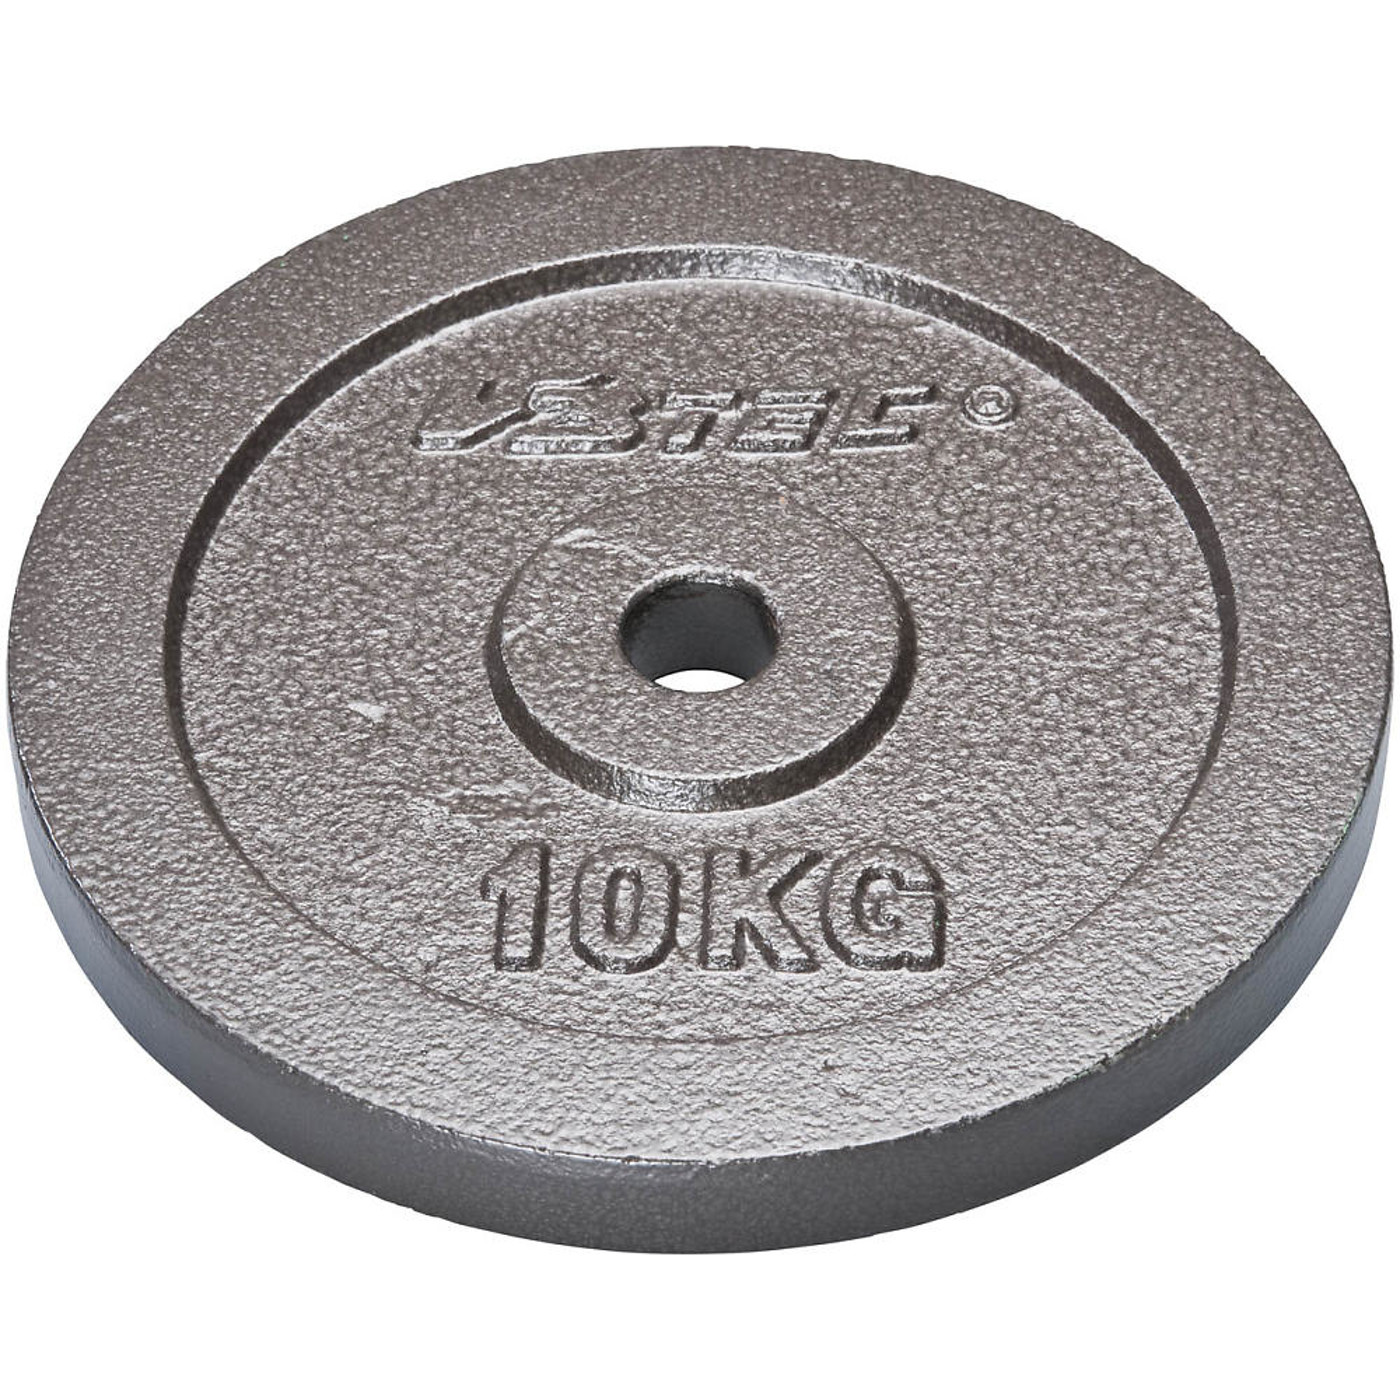 V3TEC Gussscheibe 10 kg